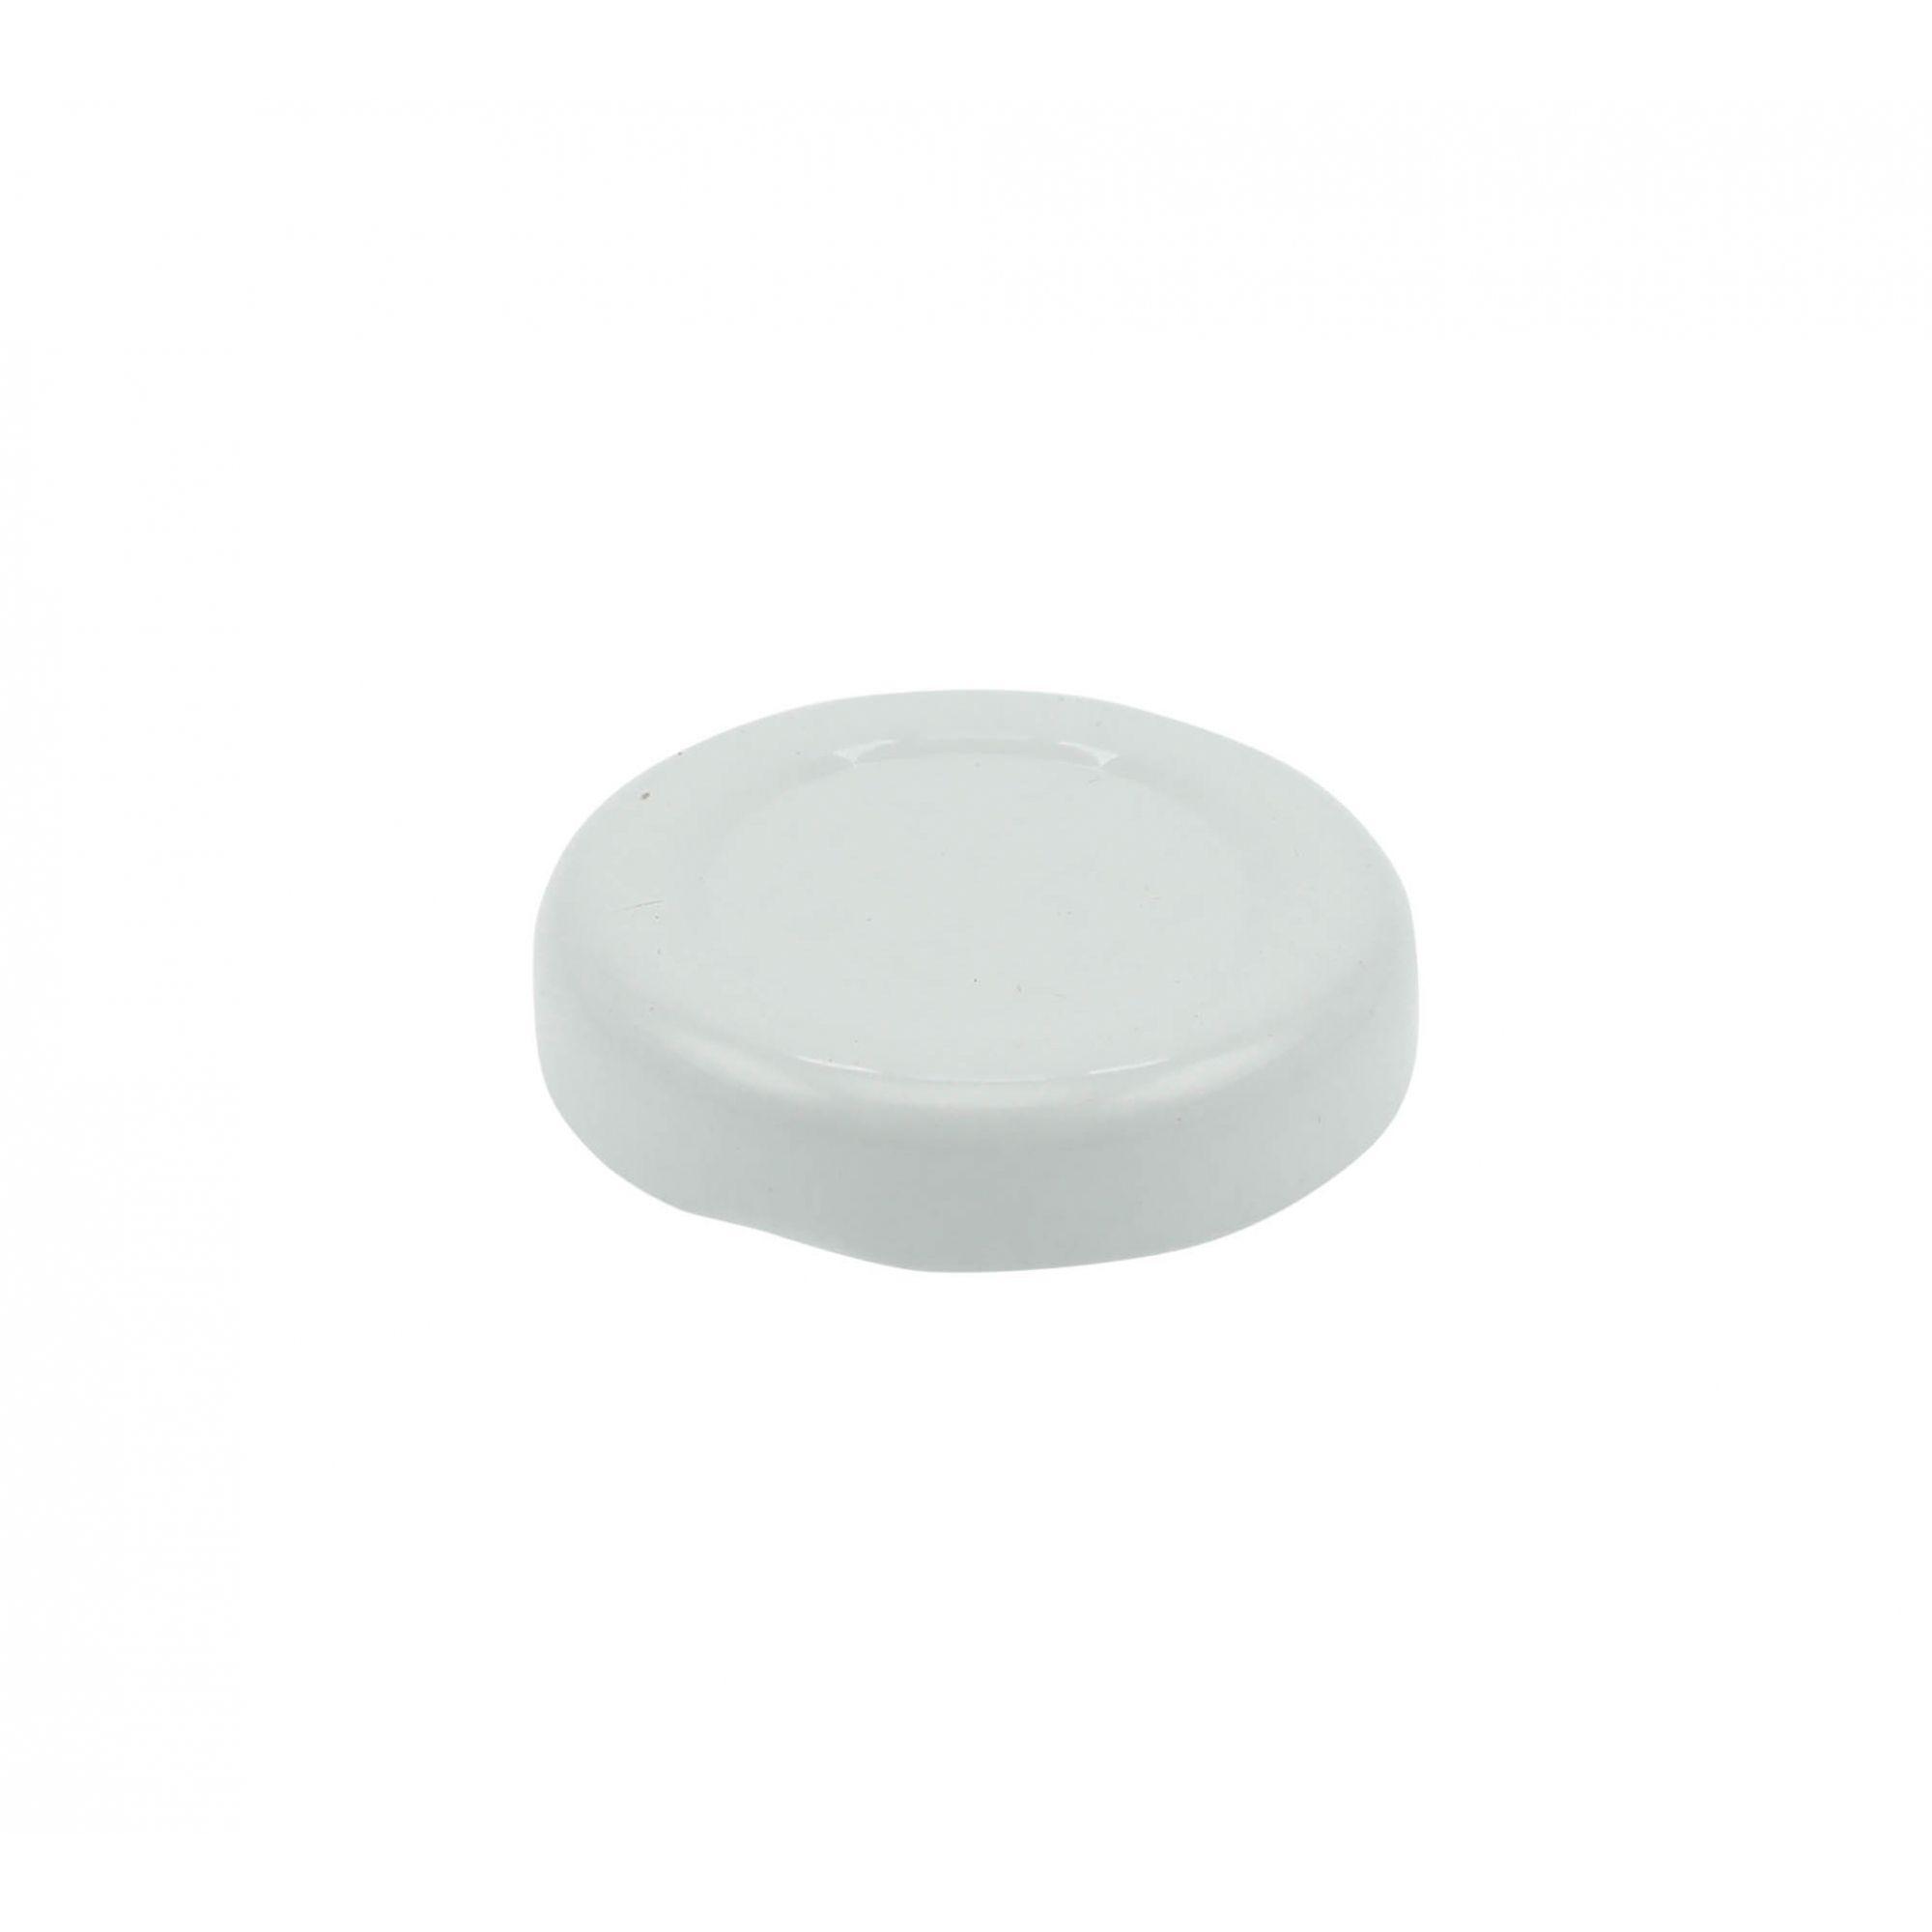 Potes Mini Sextavado 40ml - Caixa com 100